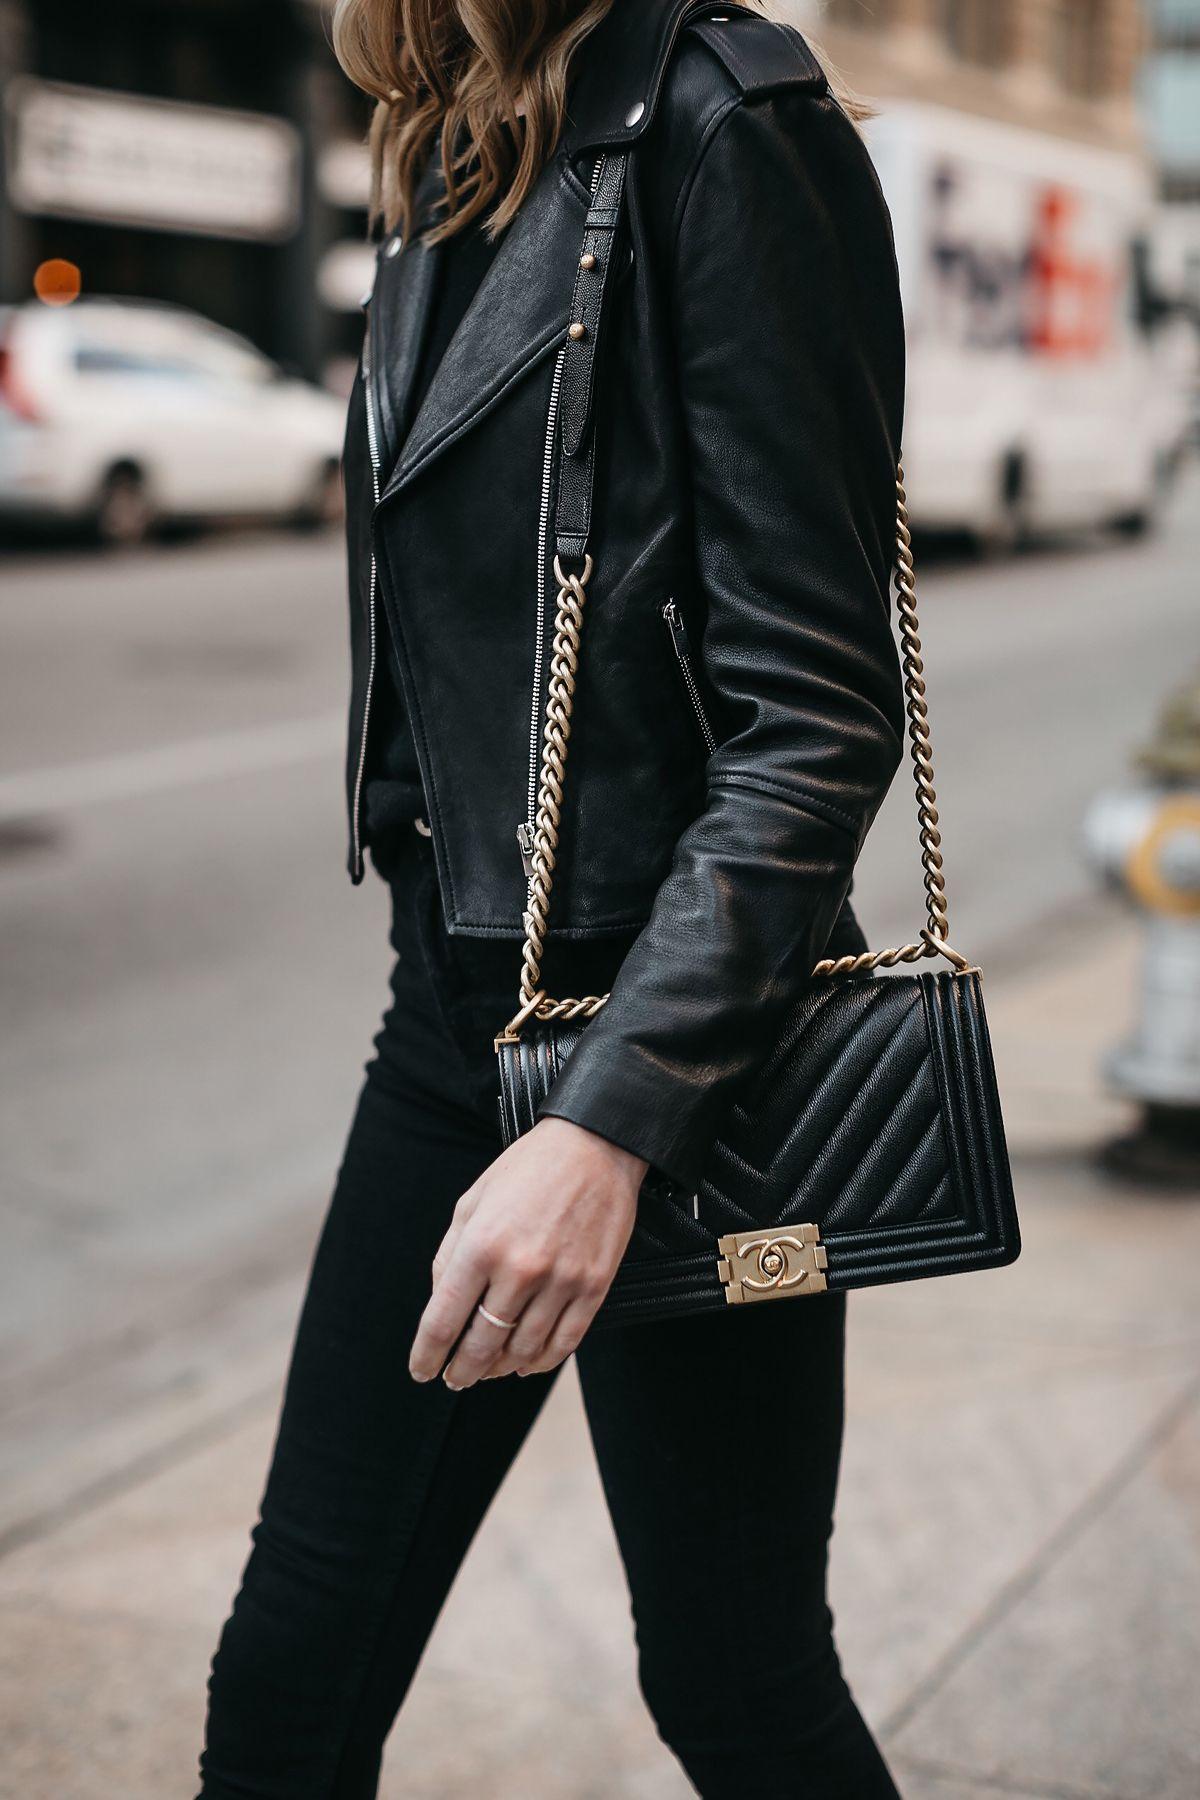 93cc1fc39378 A Stylish Way to Wear a Black Leather Jacket | Fashion Jackson ...